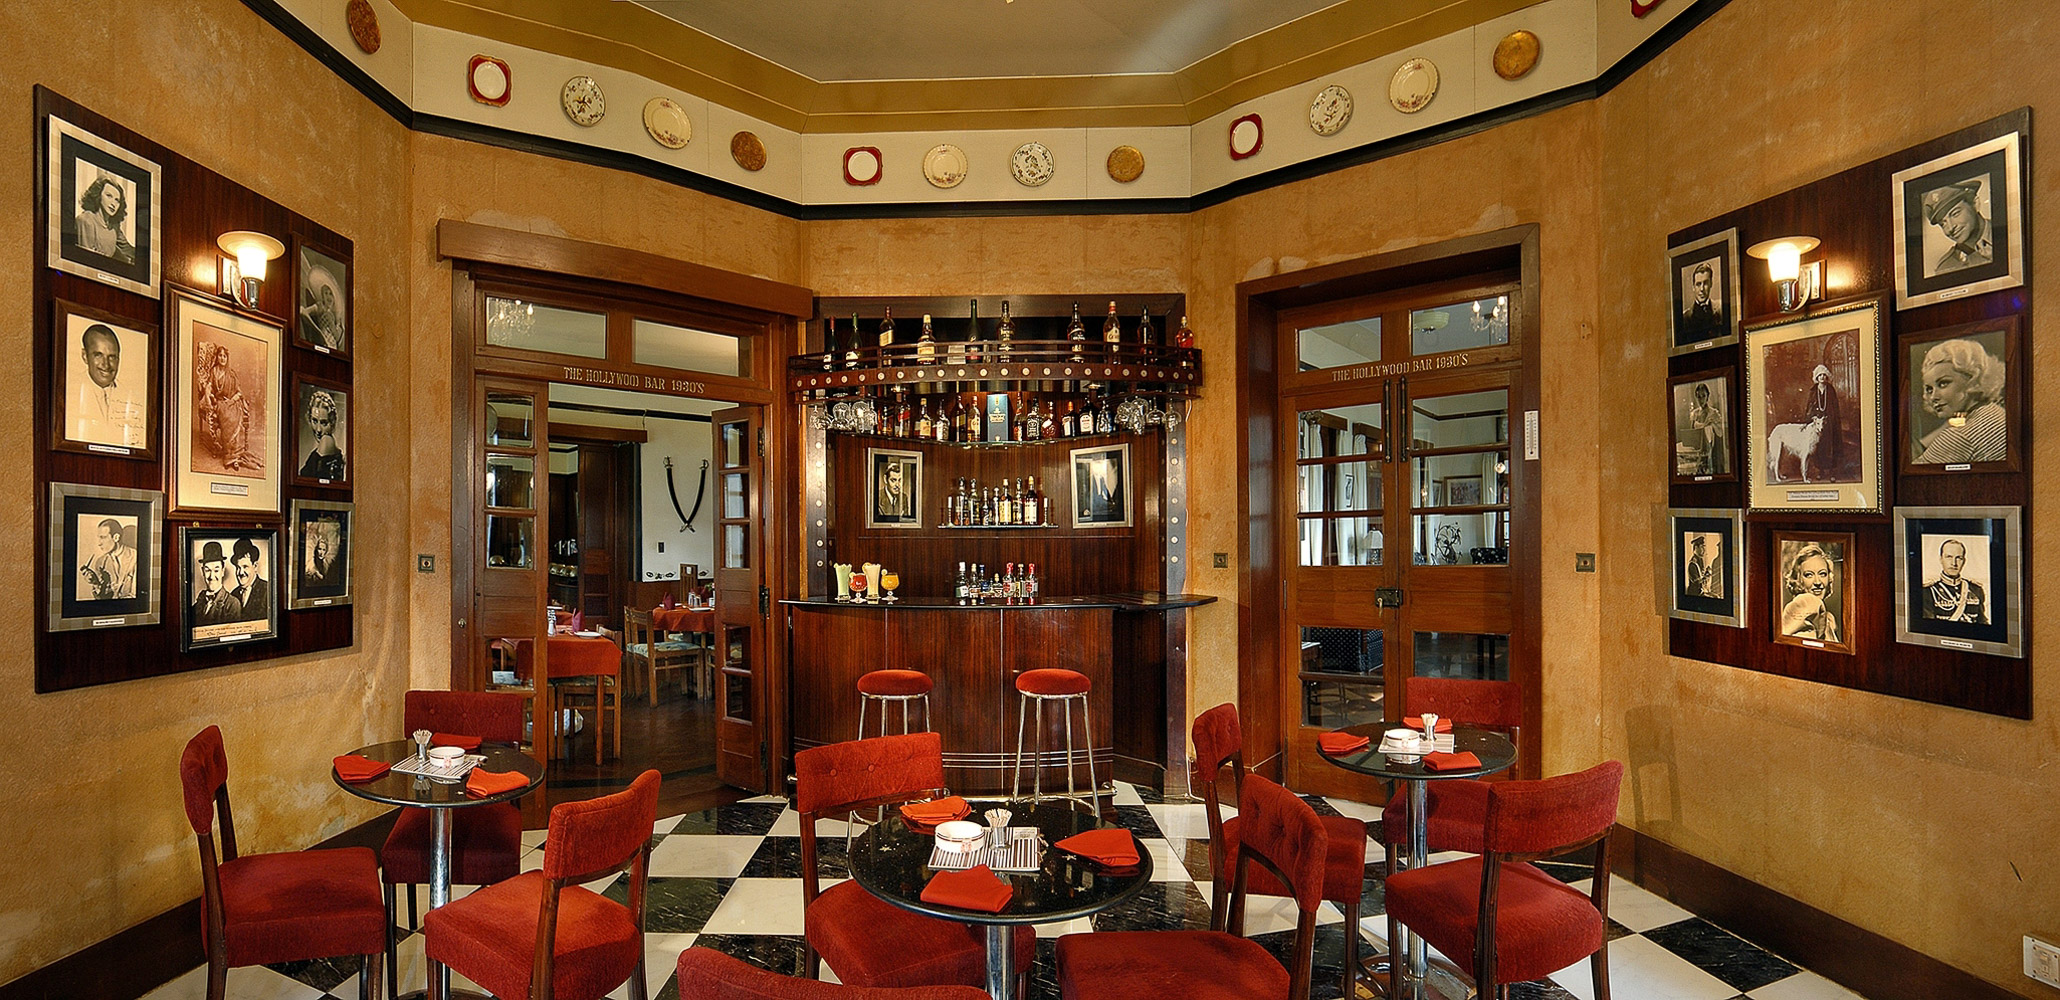 Bar at the Woodville Palace Hotel, Shimla